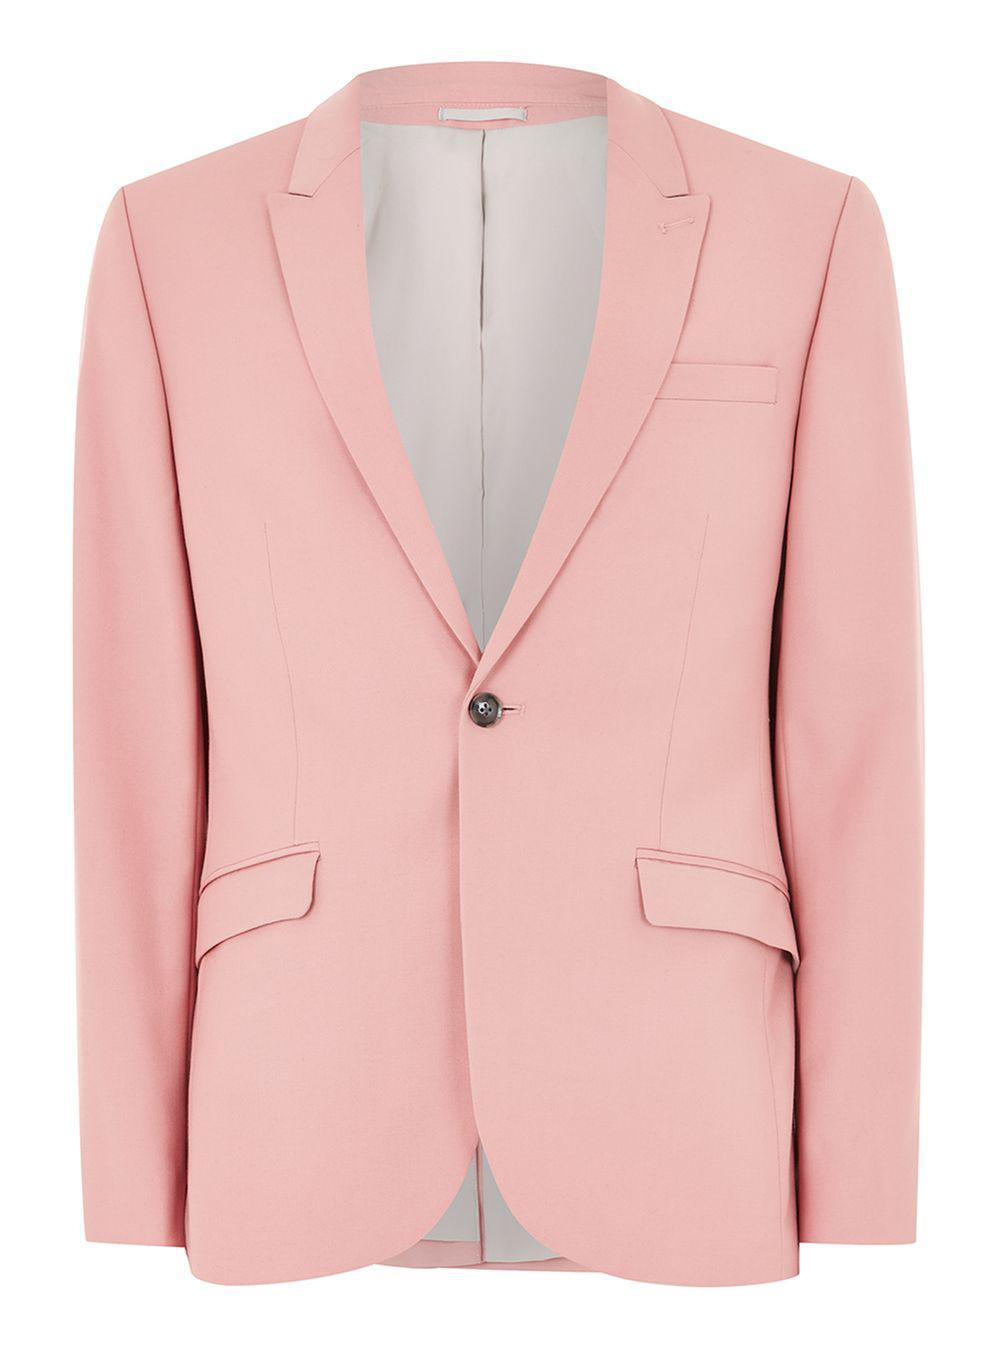 Lyst - Topman Pink Skinny Suit Jacket in Pink for Men